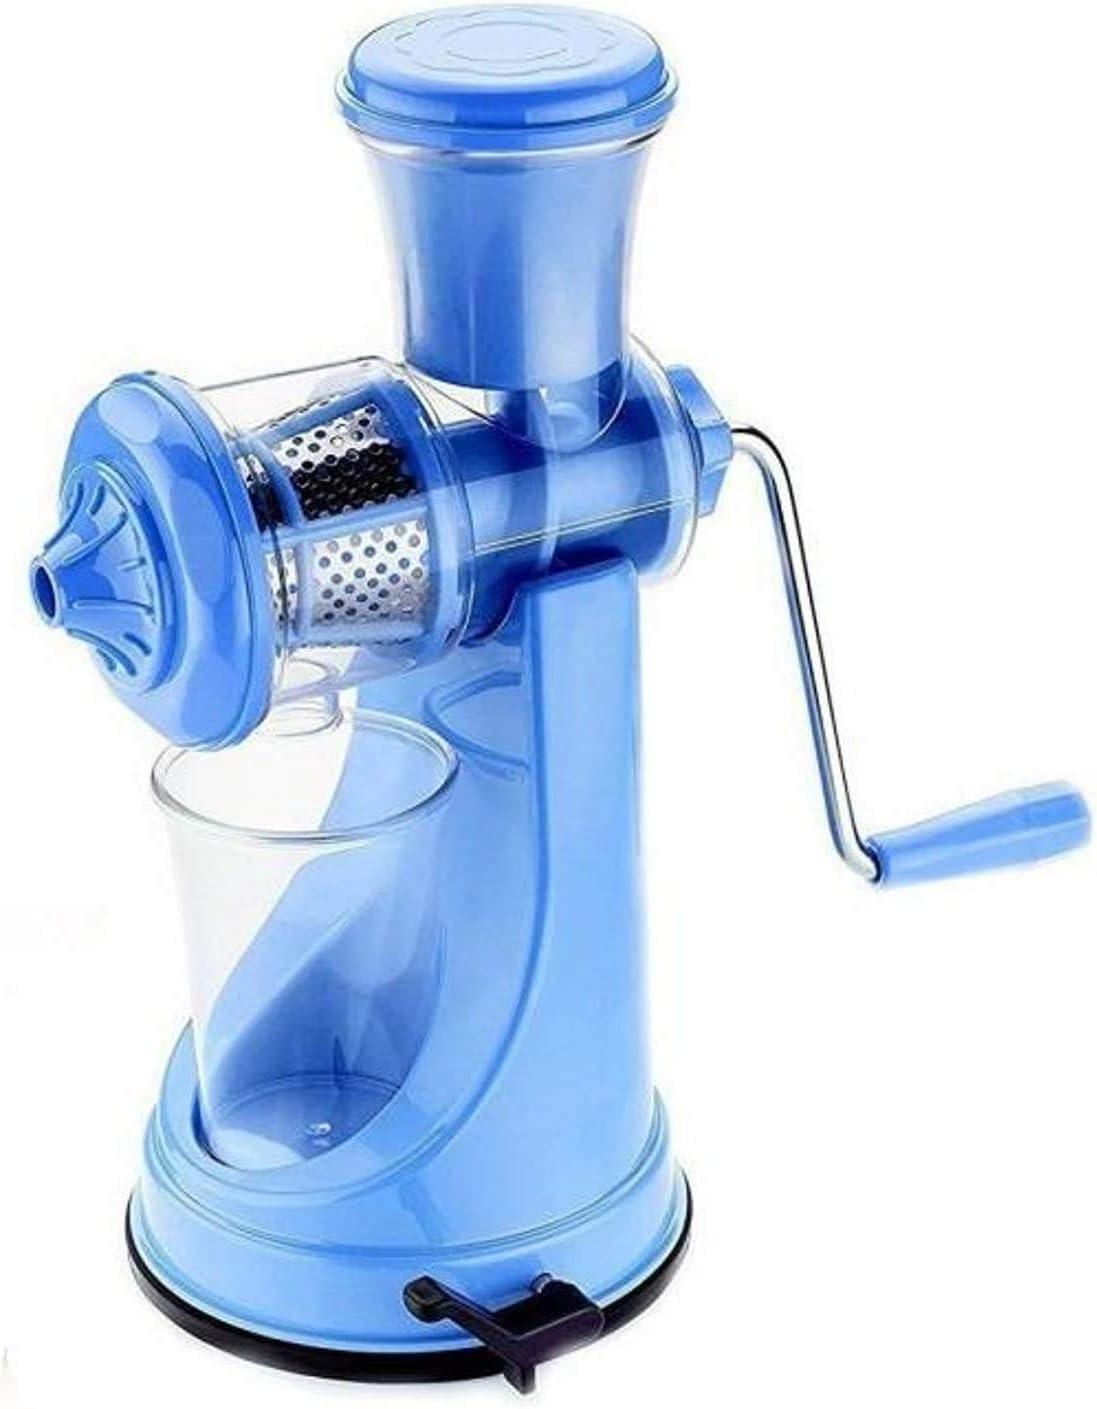 Khandekar Manual Hand Crank Single Auger Juicer, Manual Fruit Juicer with Handle, Vegetable Juicer for Shakes, Smoothies - 12 inch